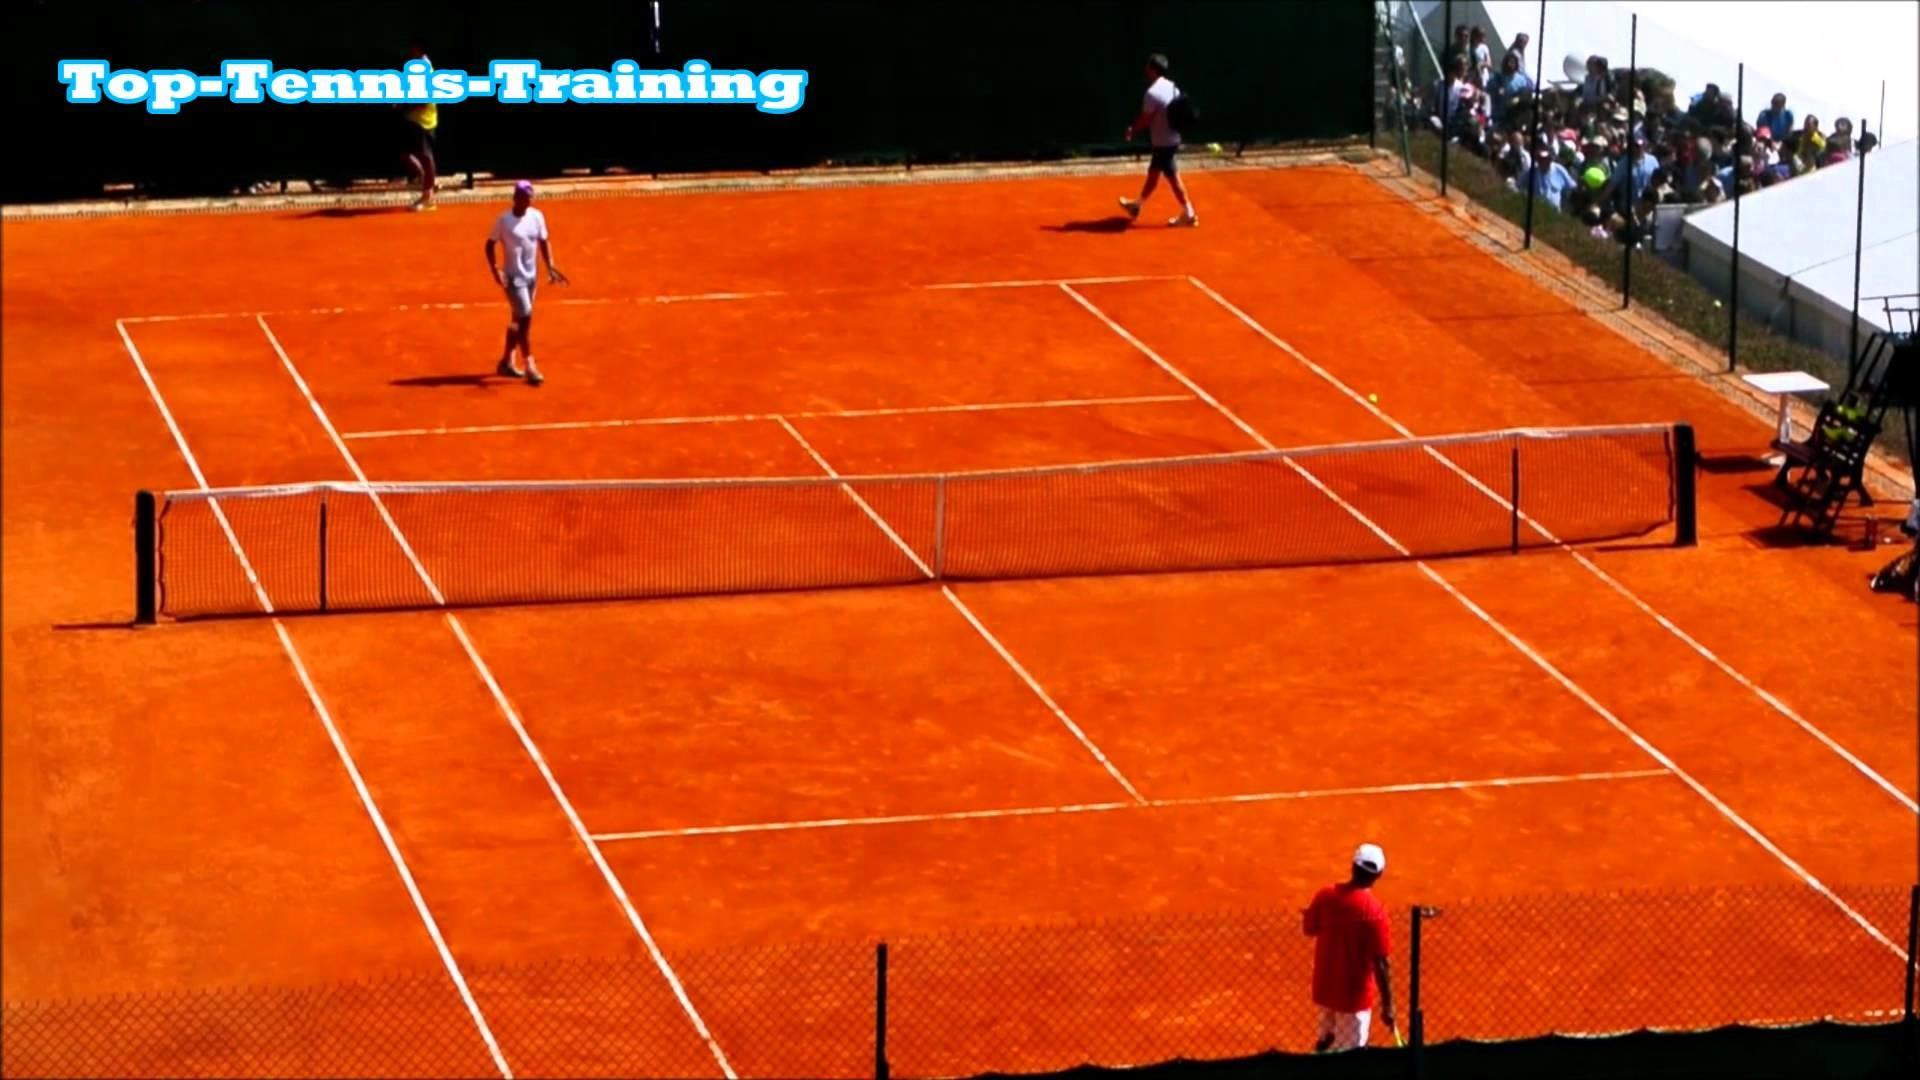 Iphone X Wallpaper Live Tennis Court Wallpaper 64 Images